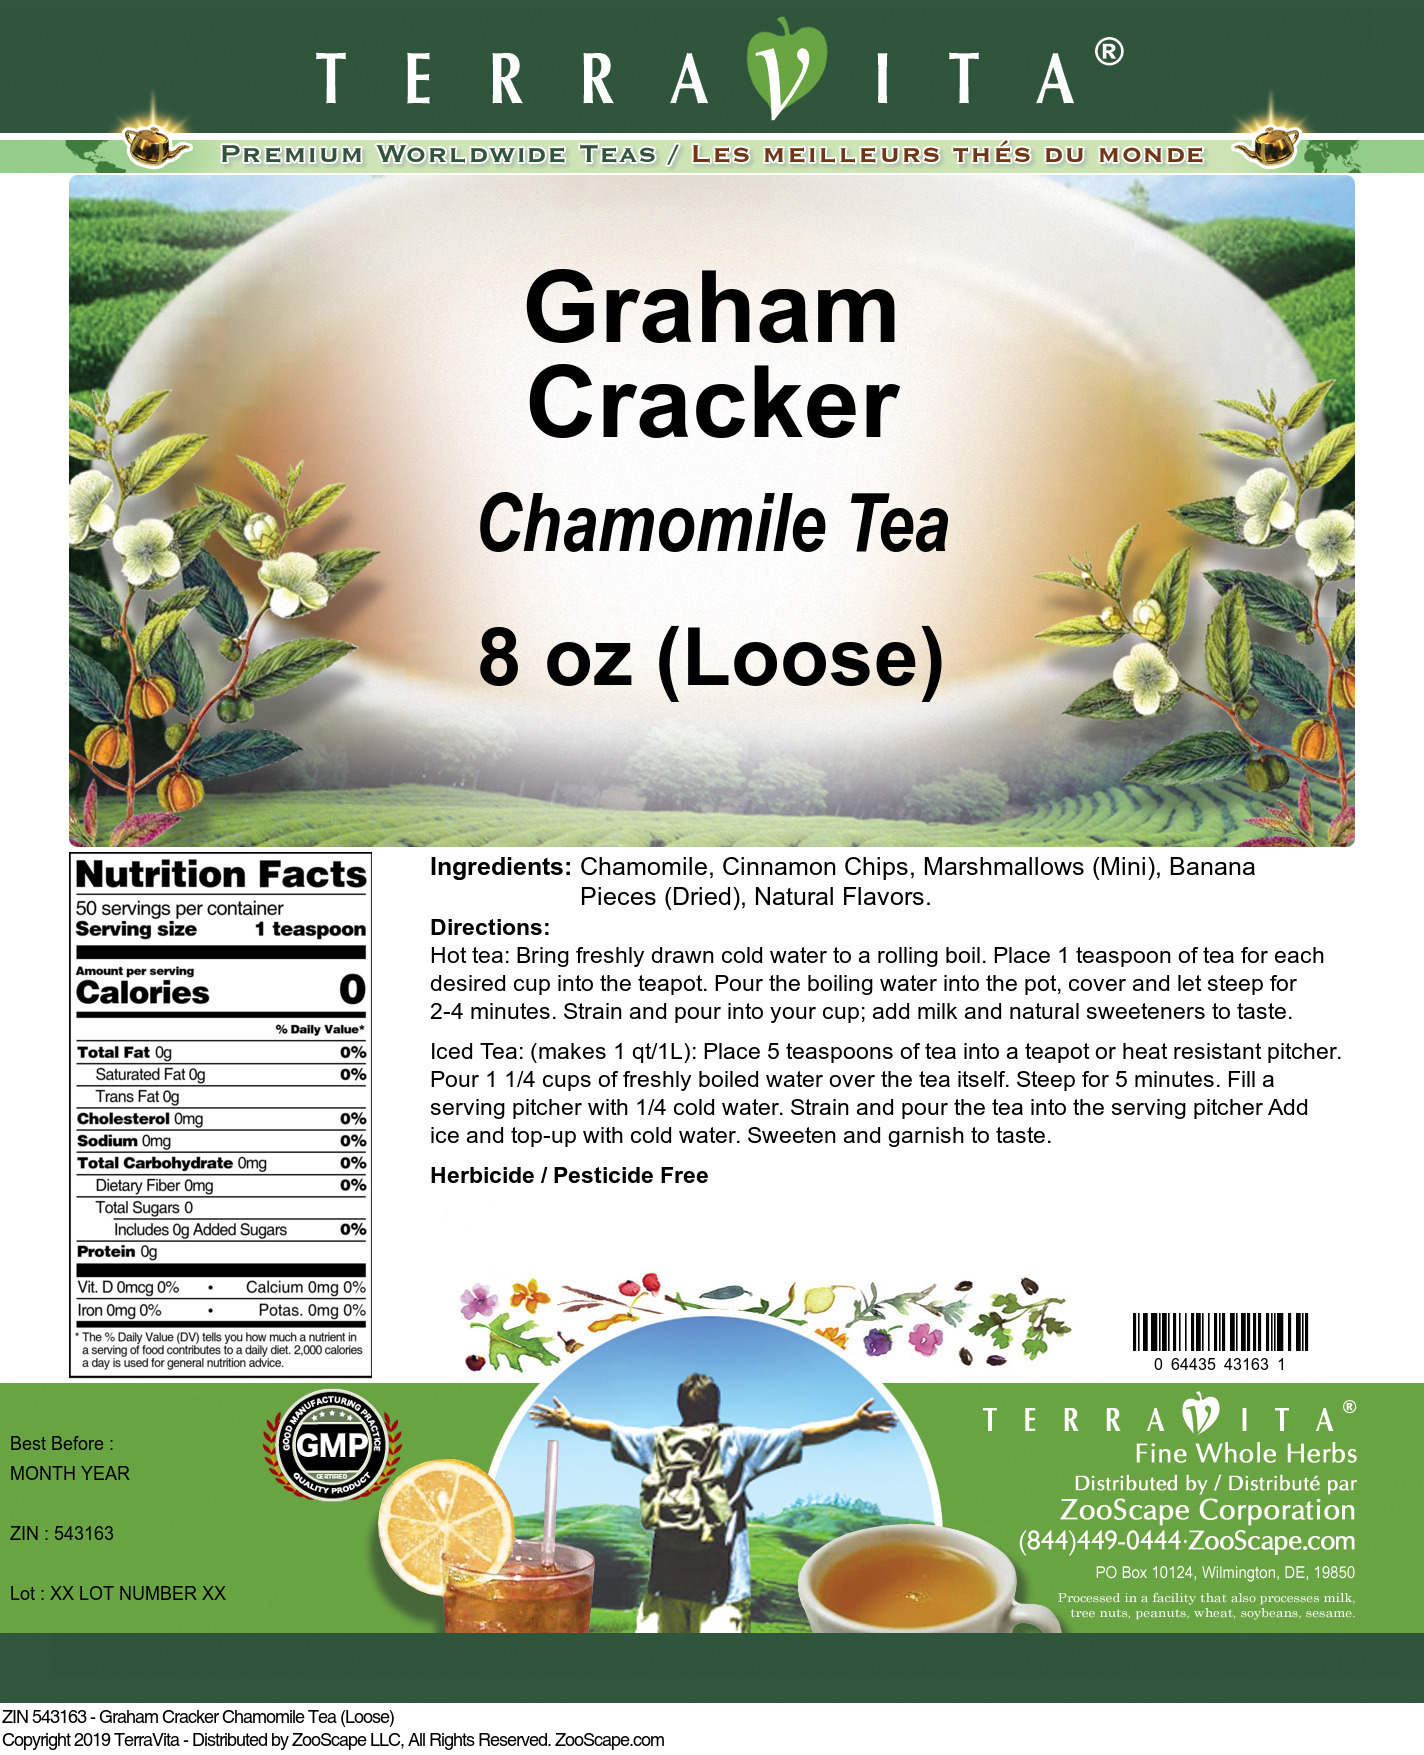 Graham Cracker Chamomile Tea (Loose)